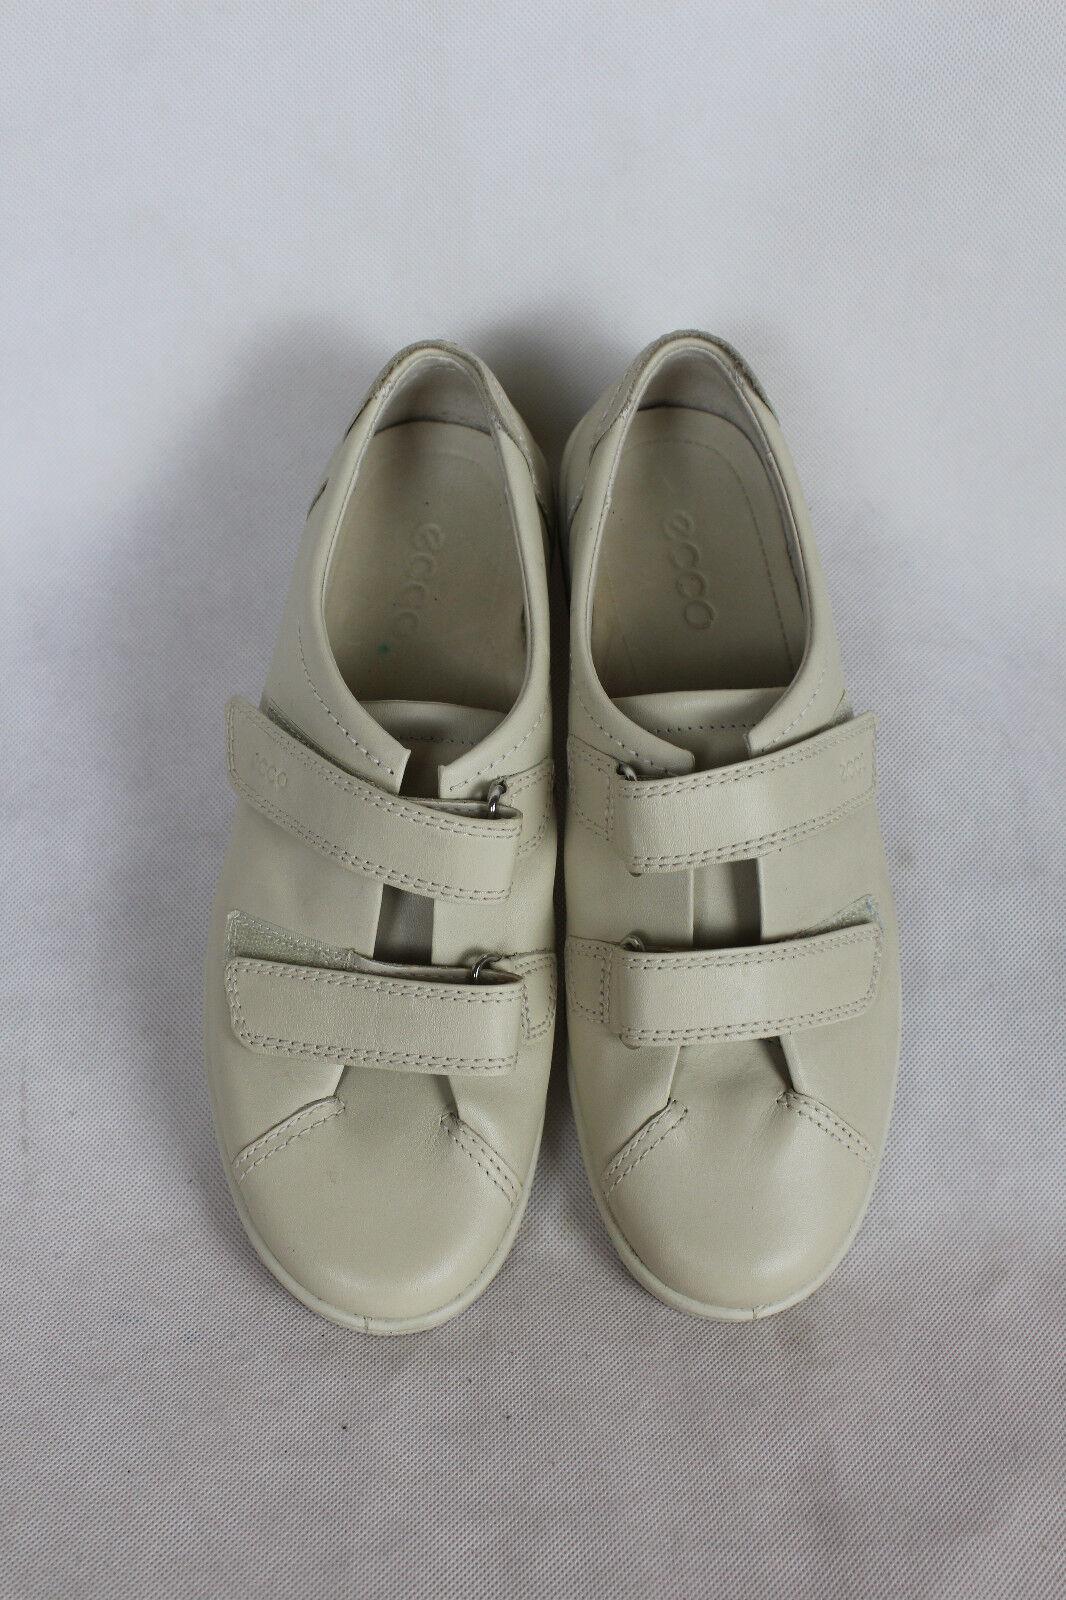 Ecco Schuhe Damen Gr.41,5 (42),sehr guter Zustand